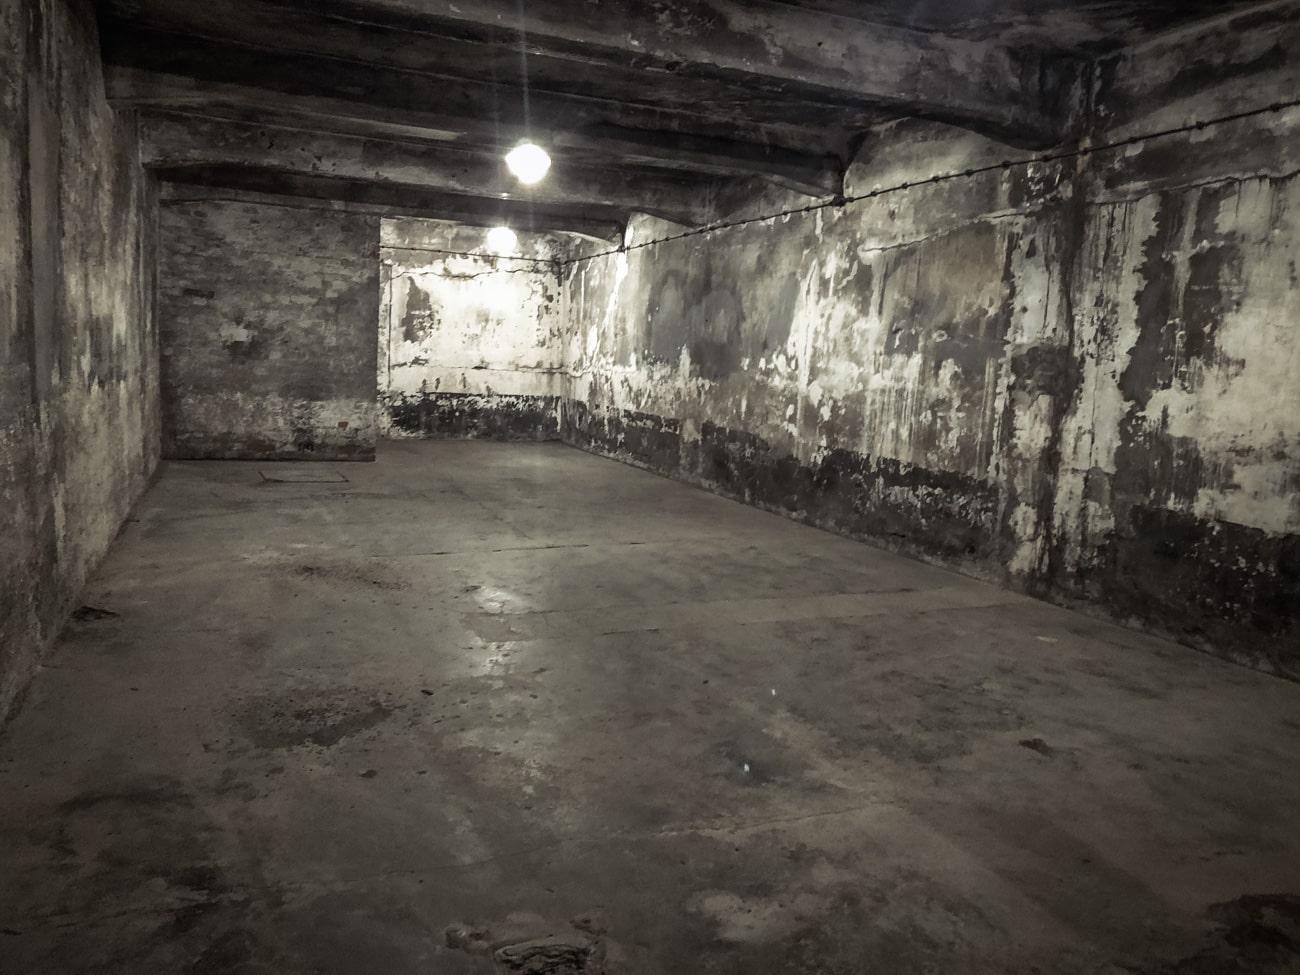 Gas Chamber in Auschwitz I, Main Camp